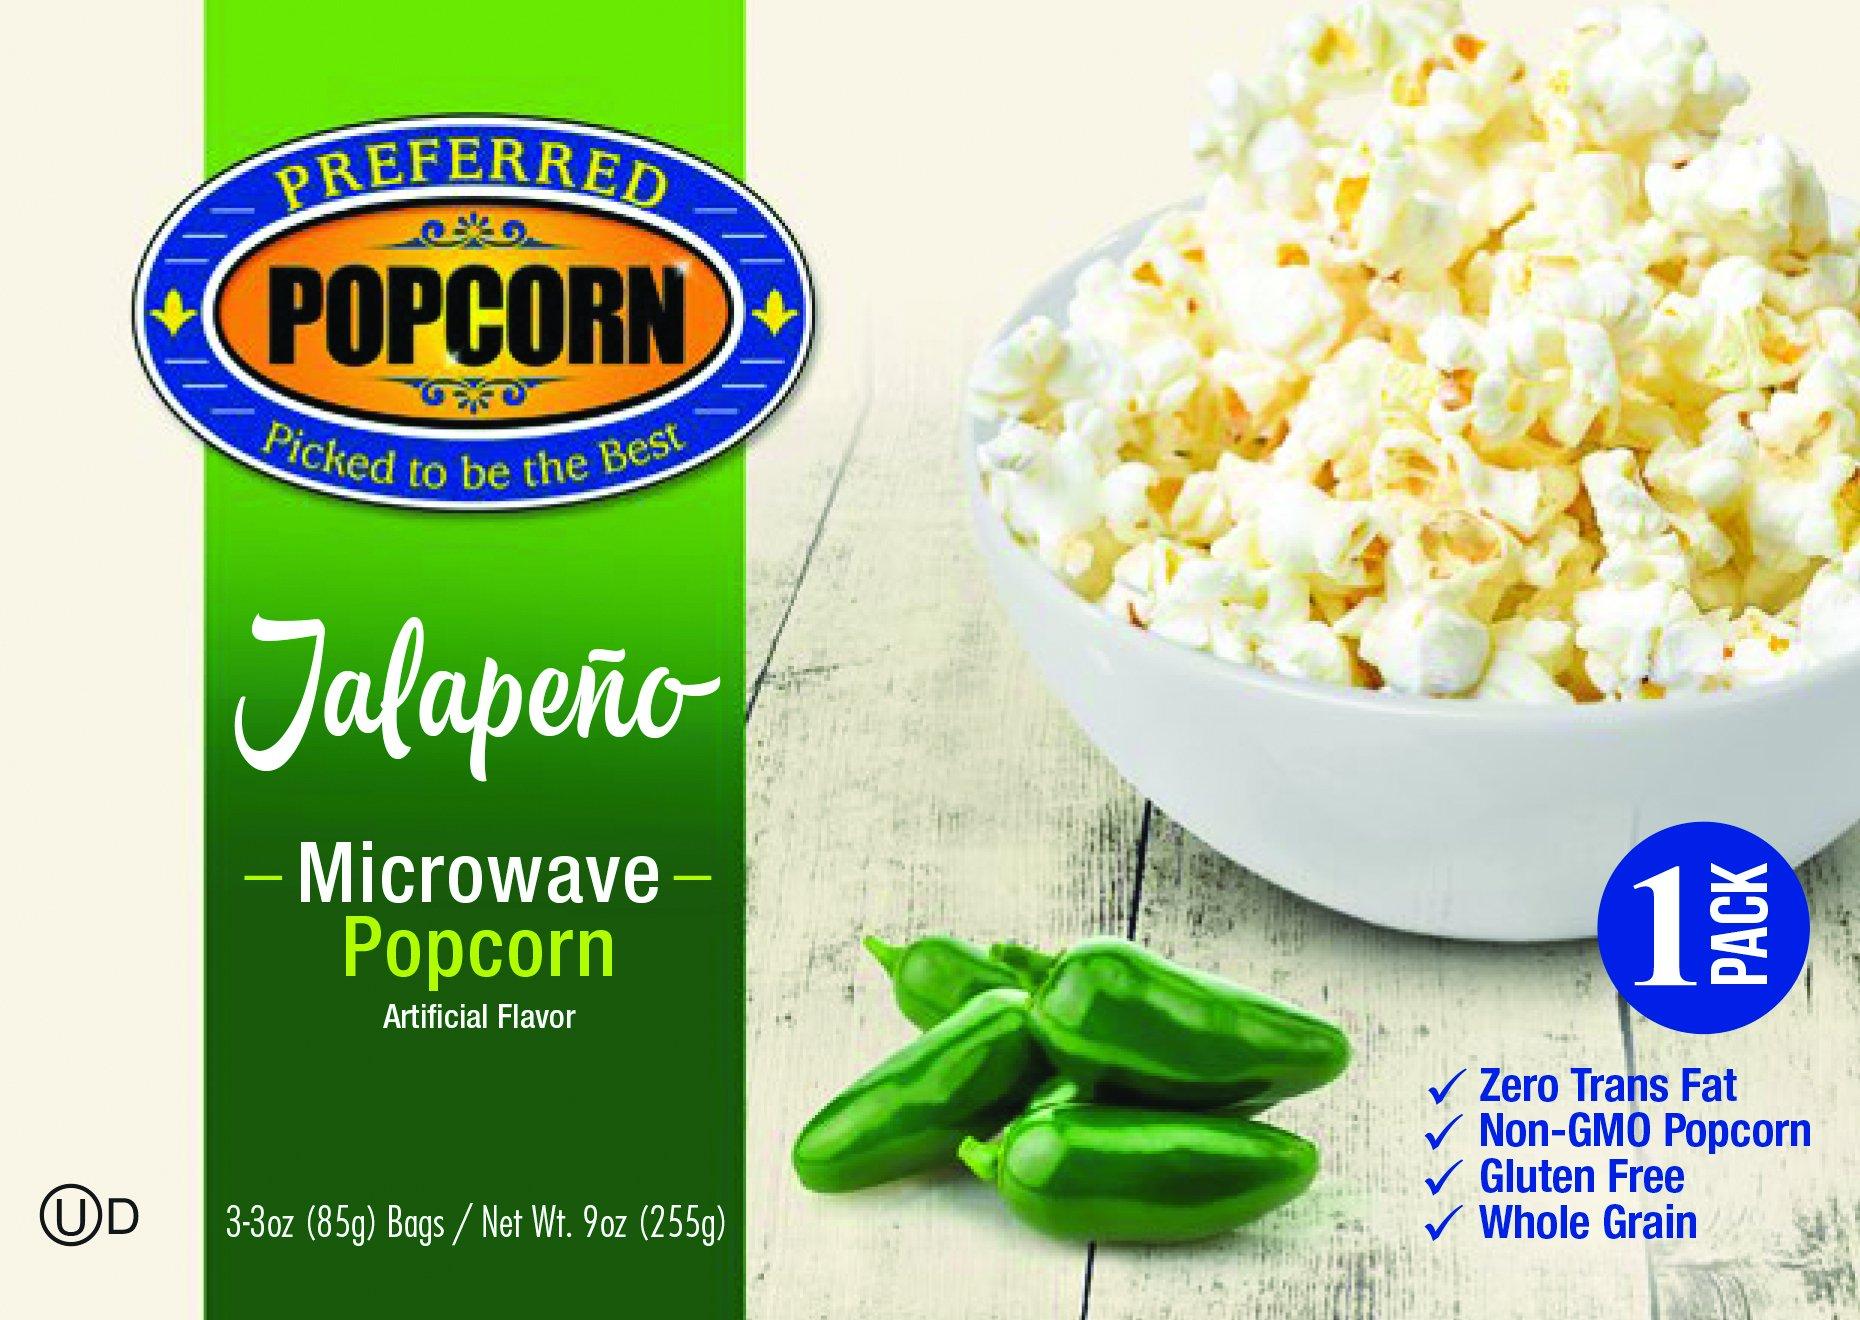 Microwave Jalapeno Popcorn - 100% Farmer Owned - Preferred Popcorn - All Natural - Spicy Snack - One 3.0 oz Bag -USA Nebraska Made - Premium Popcorn - Gluten Free - NonGMO - Whole Grain Fresh Popcorn